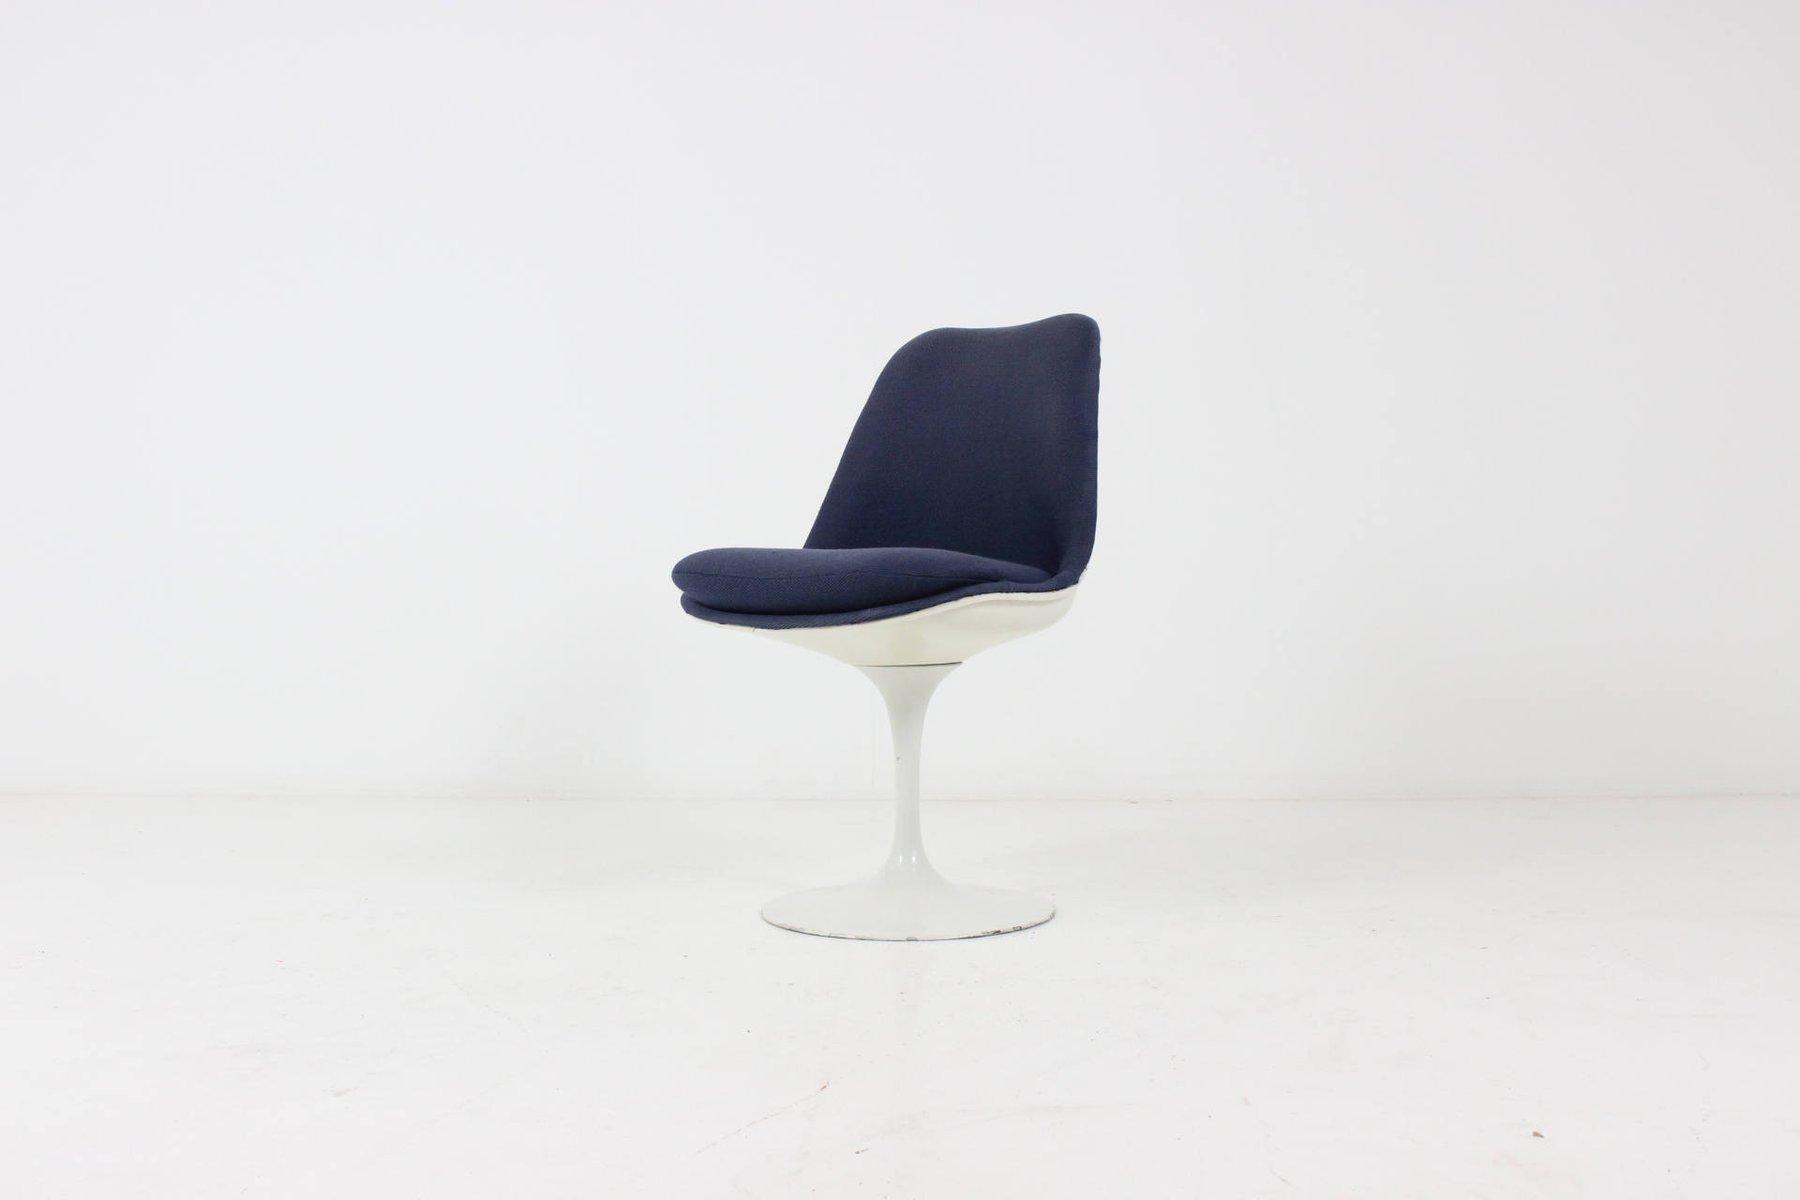 Swivel tulip chair by eero saarinen for knoll for sale at pamono - Sedia tulip knoll ...